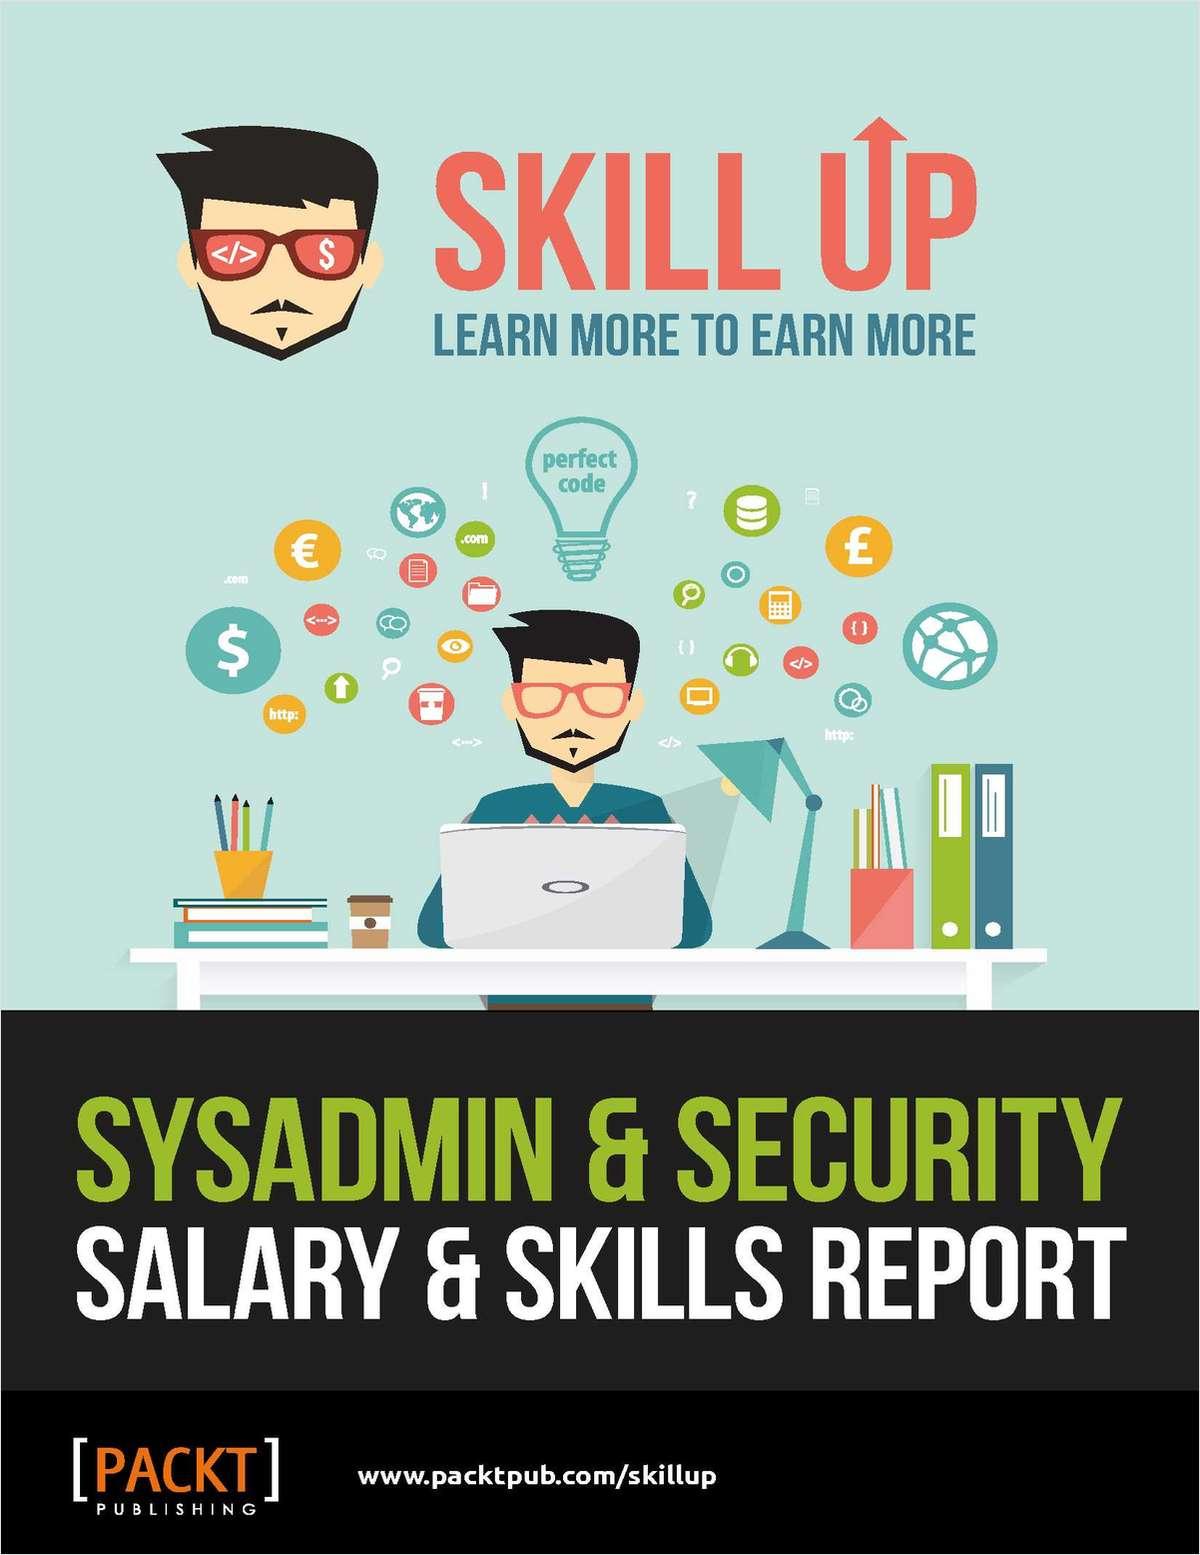 System Administration & Security - Salary & Skills Report (Plus 3 Bonus Resources!)